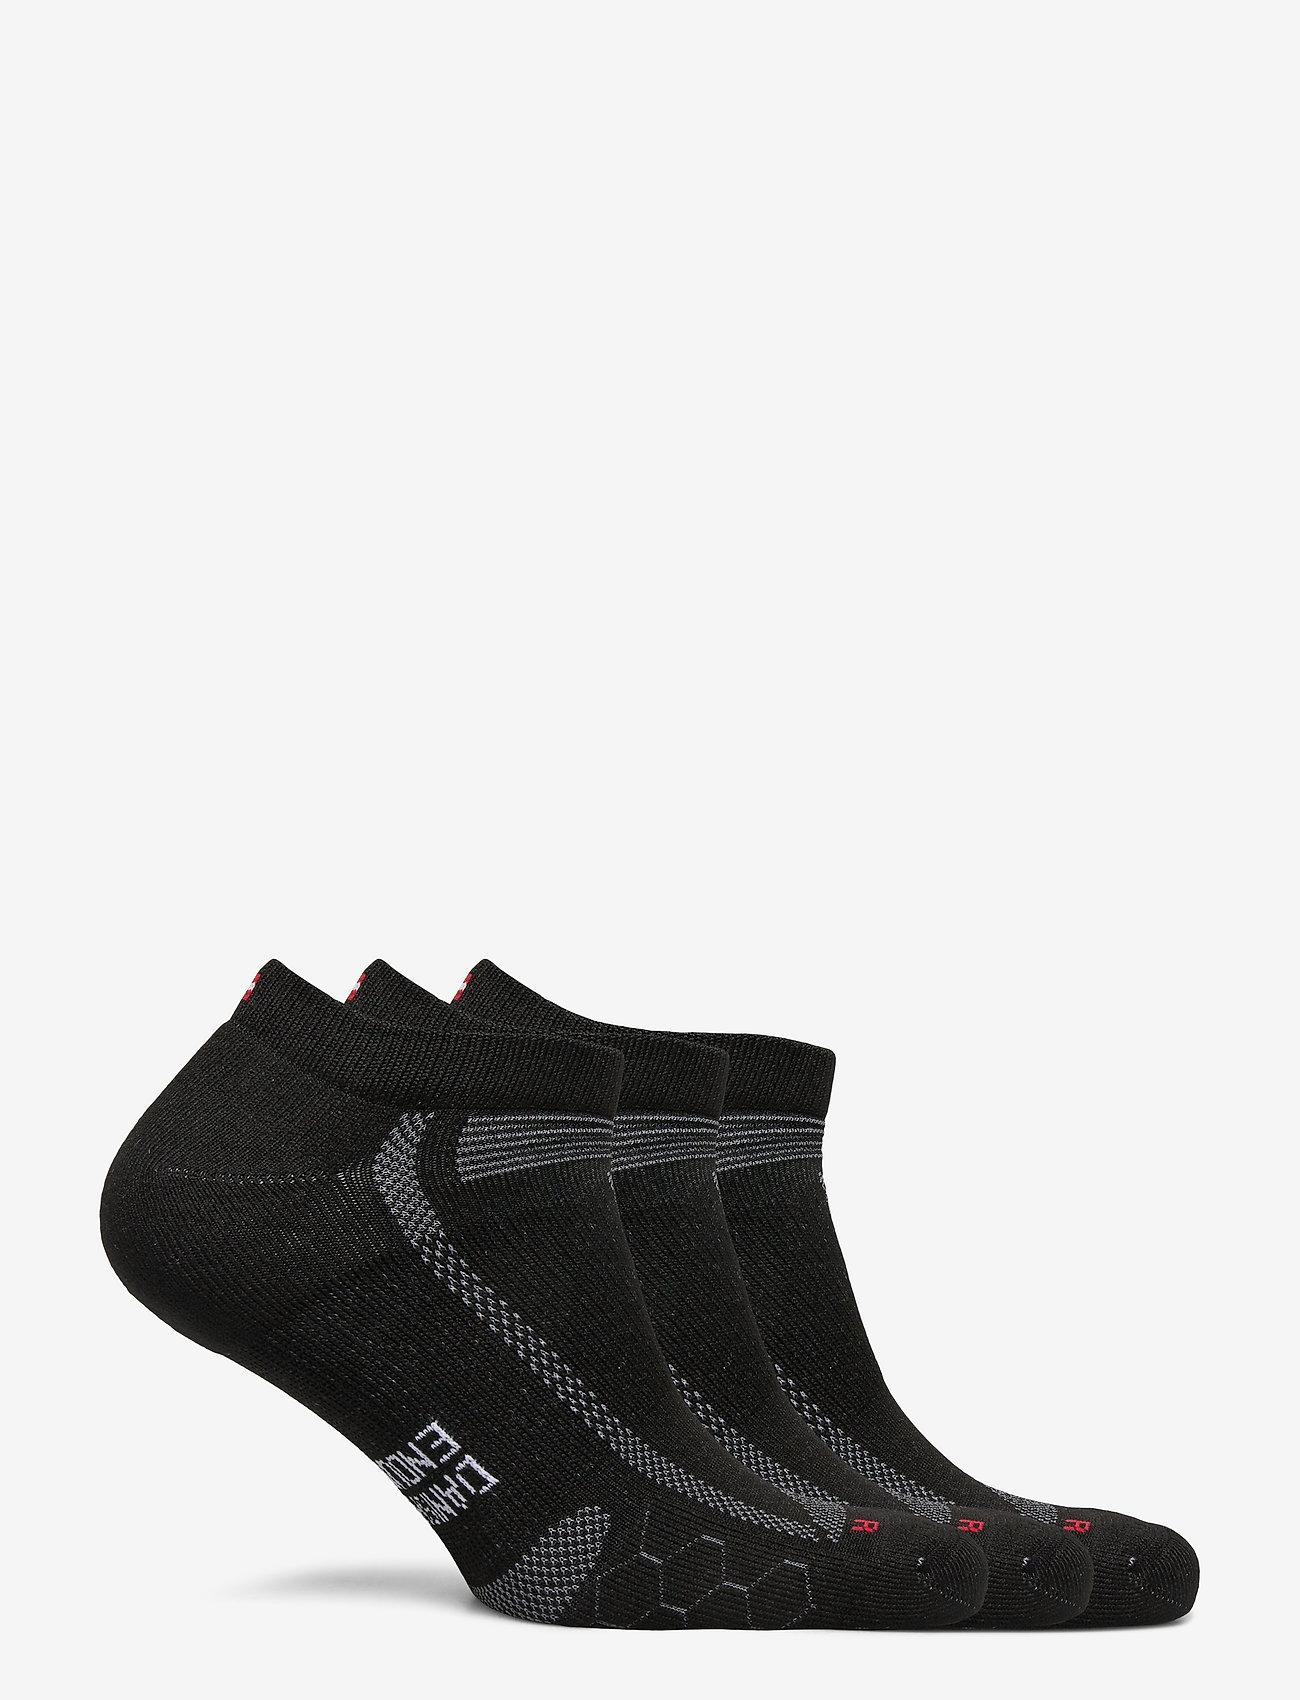 Danish Endurance - Low Cut Long Distance Running Socks 3 Pack - kousen - black/grey - 1